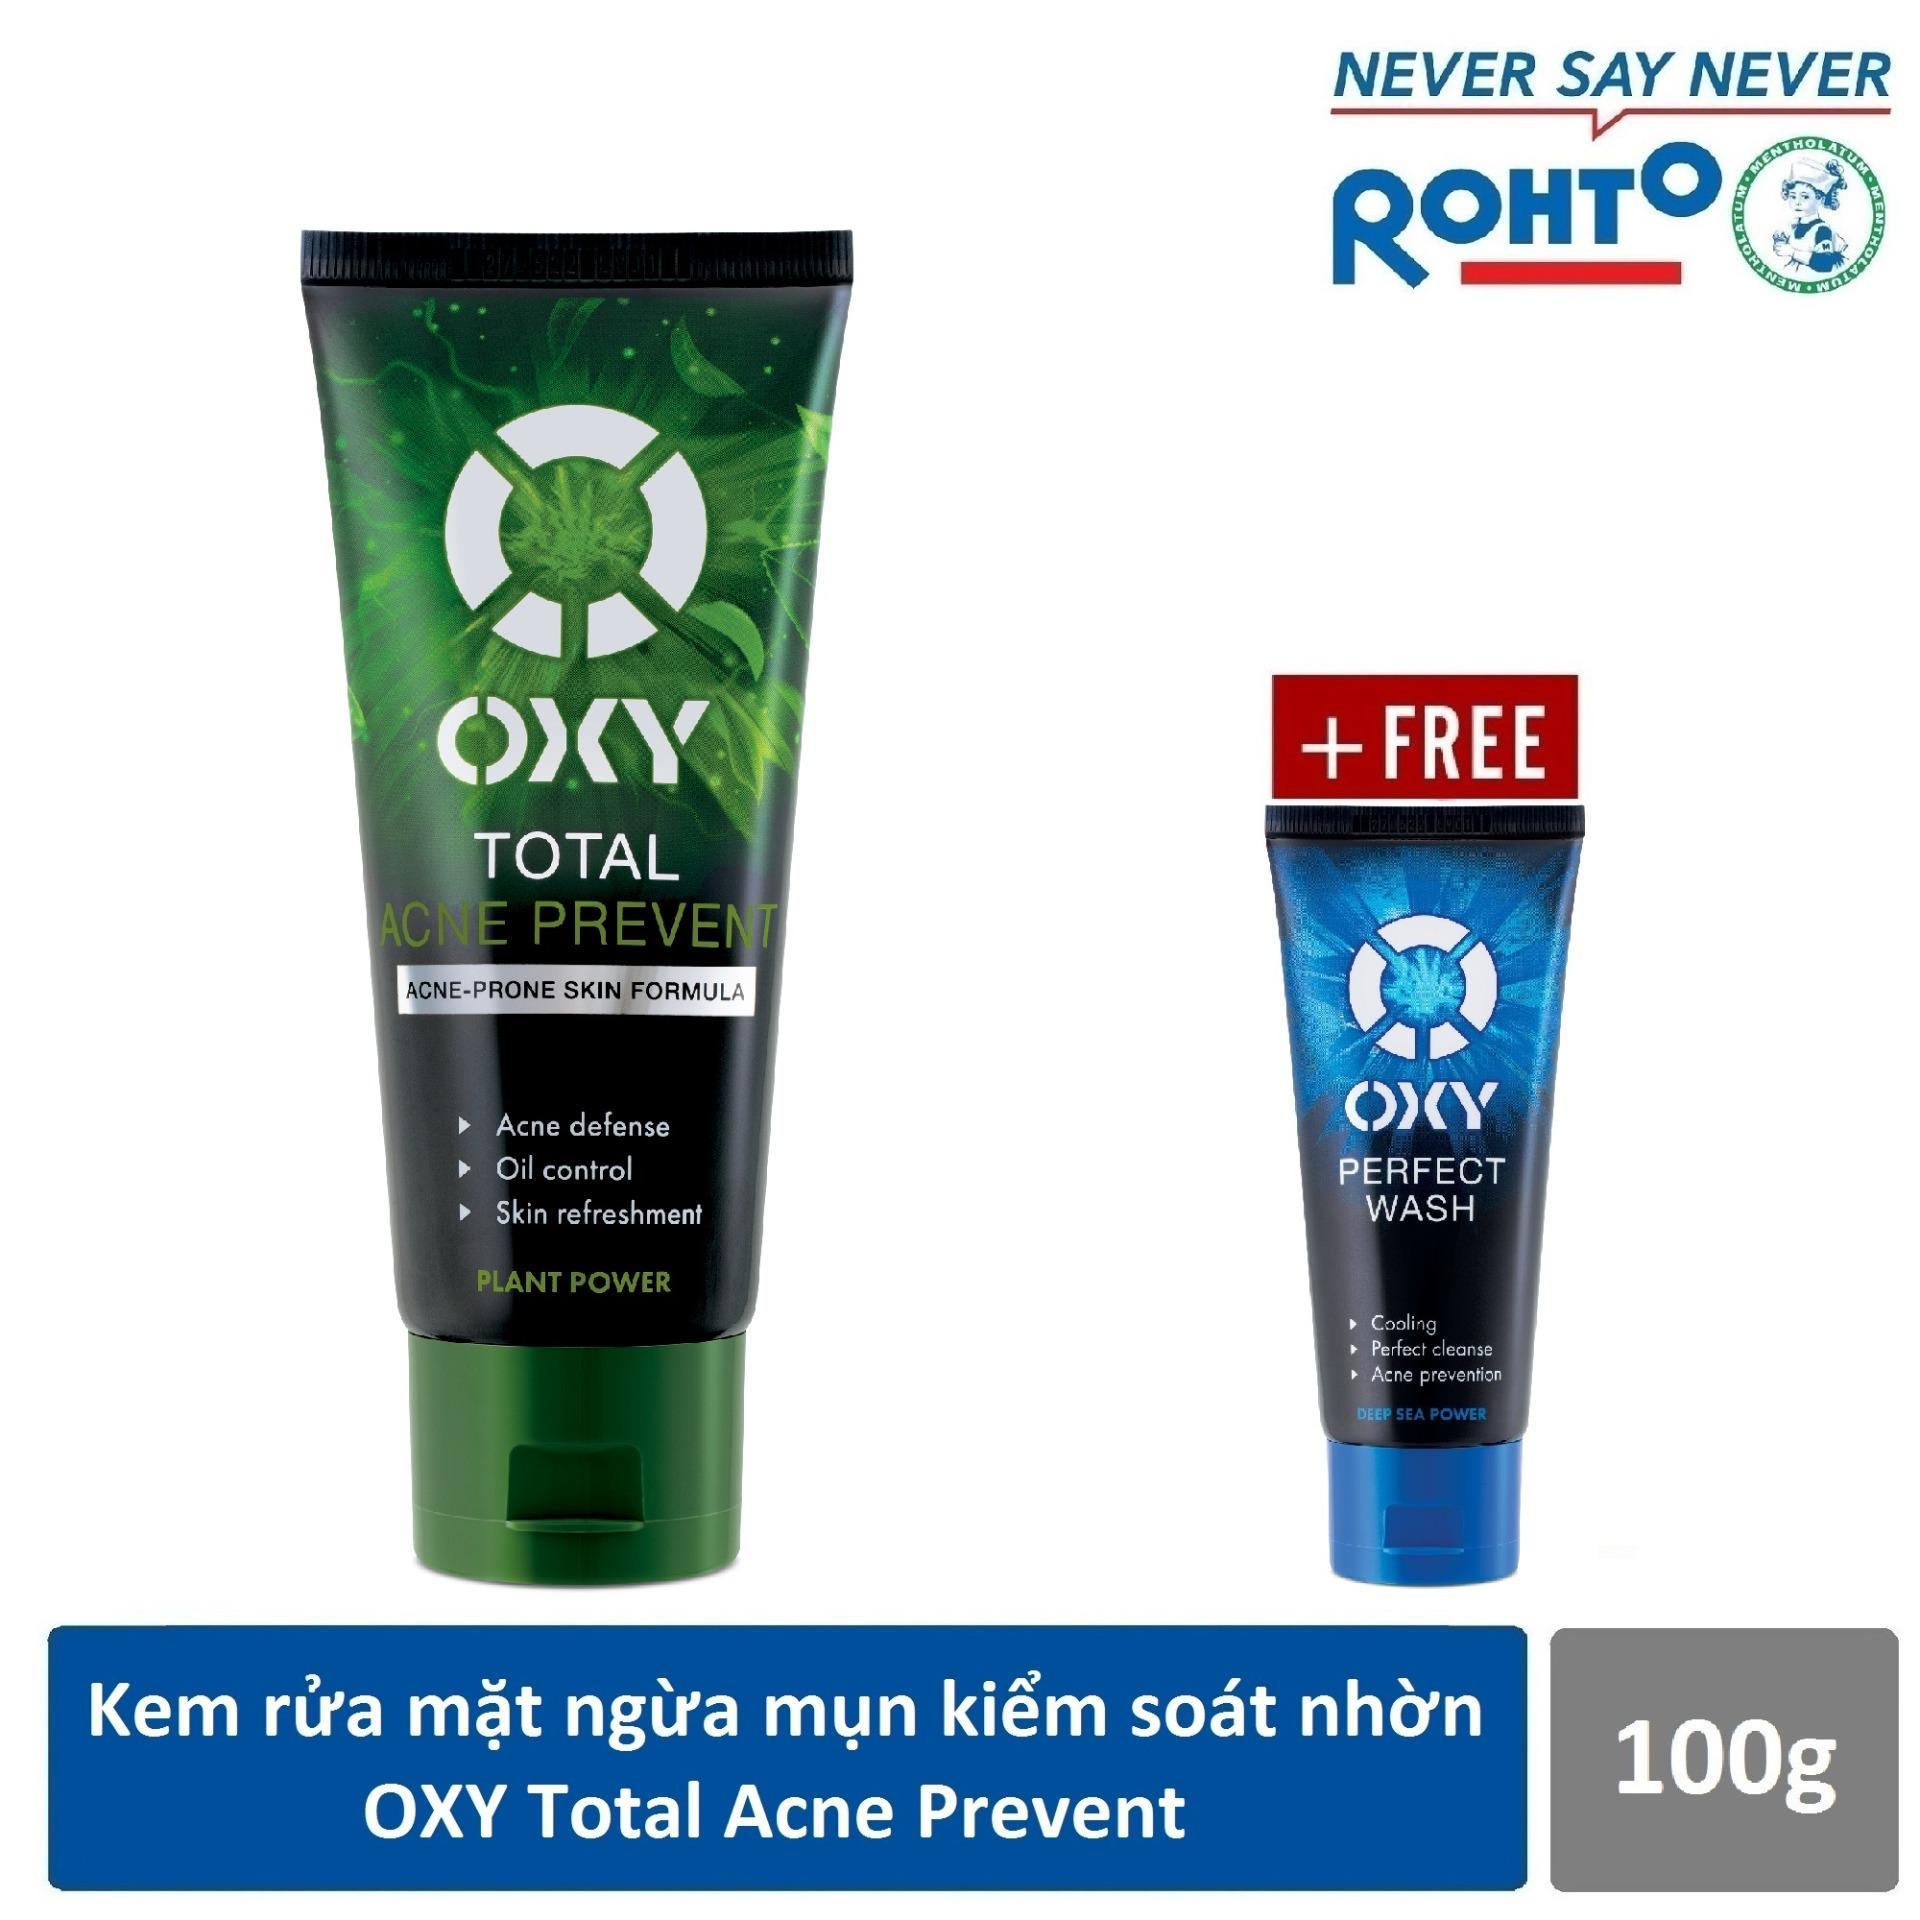 Kem rửa mặt ngừa mụn kiểm soát nhờn OXY Total Acne Prevent 100g + Tặng Kem rửa mặt mát lạnh OXY Perfect Wash 25g